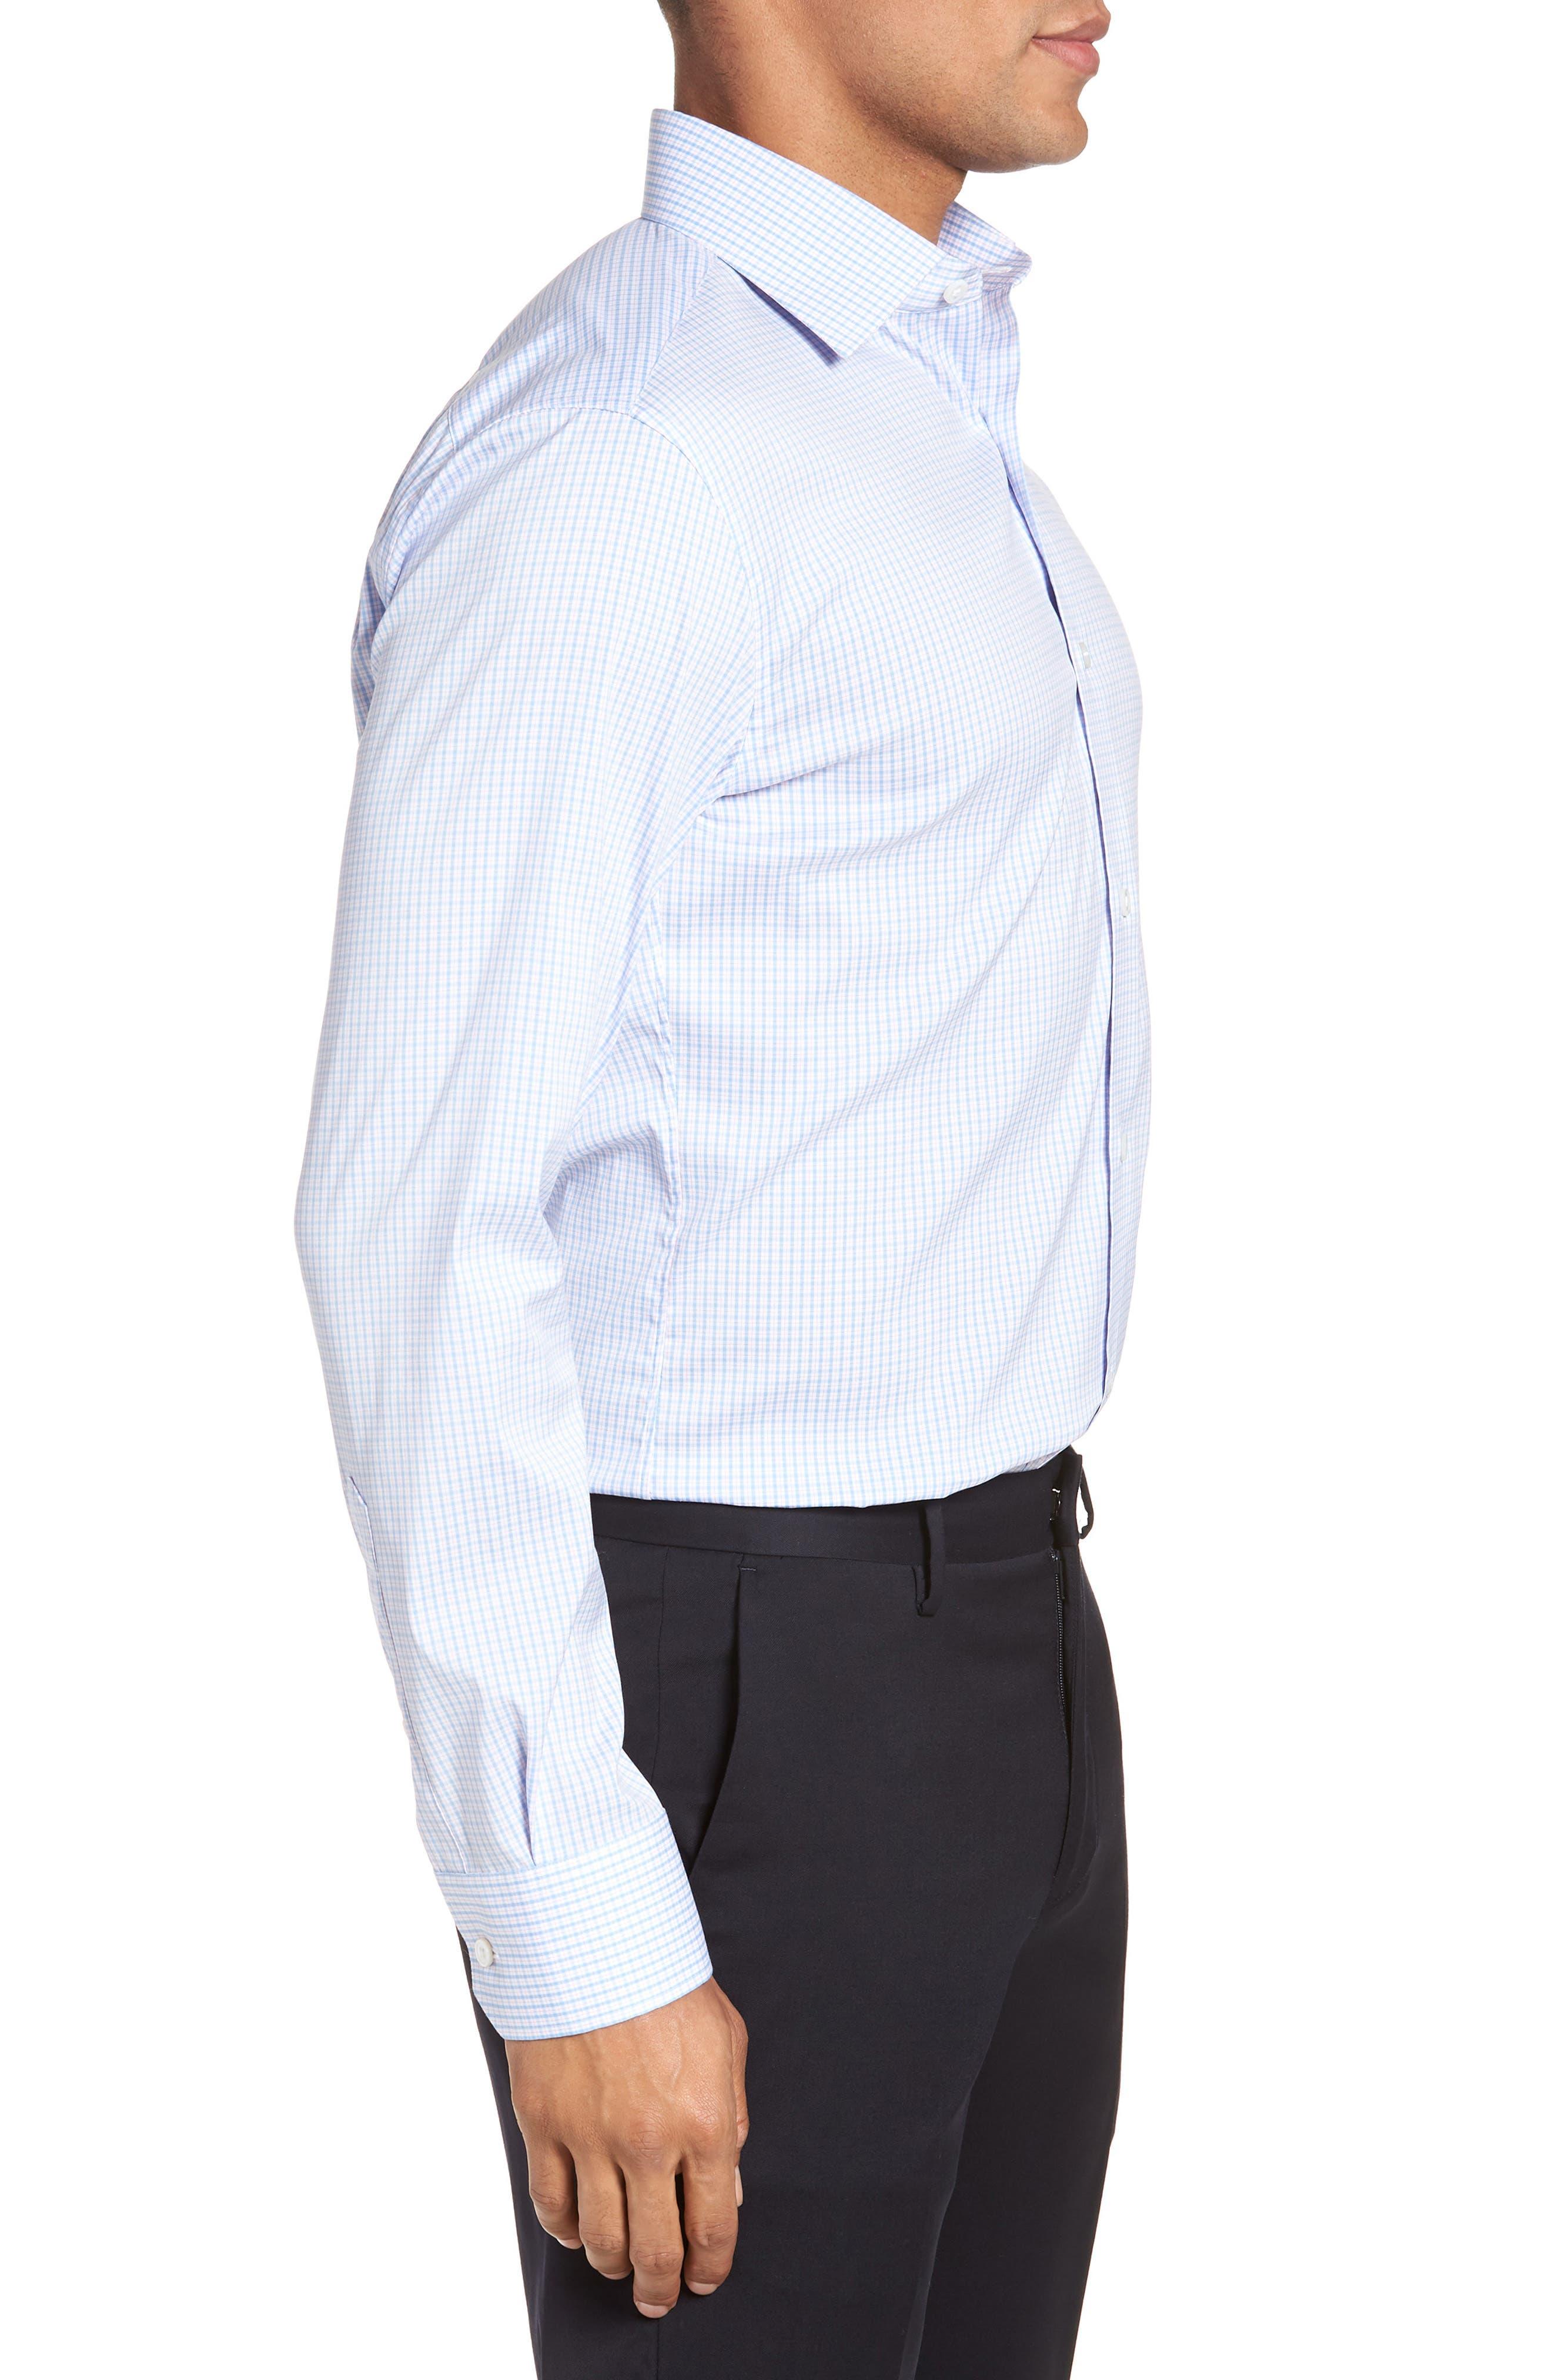 Soundview Slim Fit Stretch Check Dress Shirt,                             Alternate thumbnail 4, color,                             400